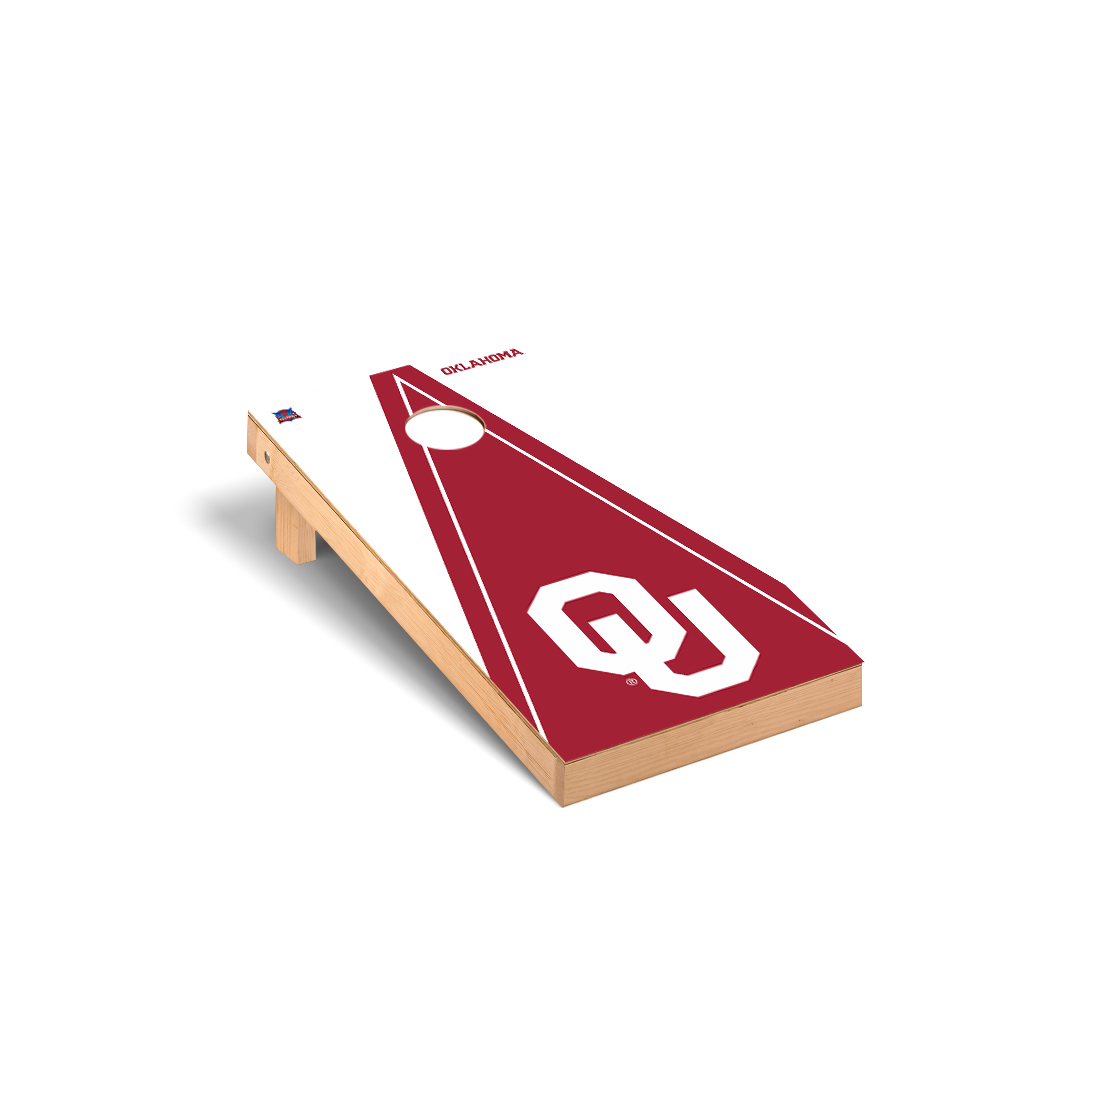 Oklahoma Sooner Cornhole Game Set Triangle Version